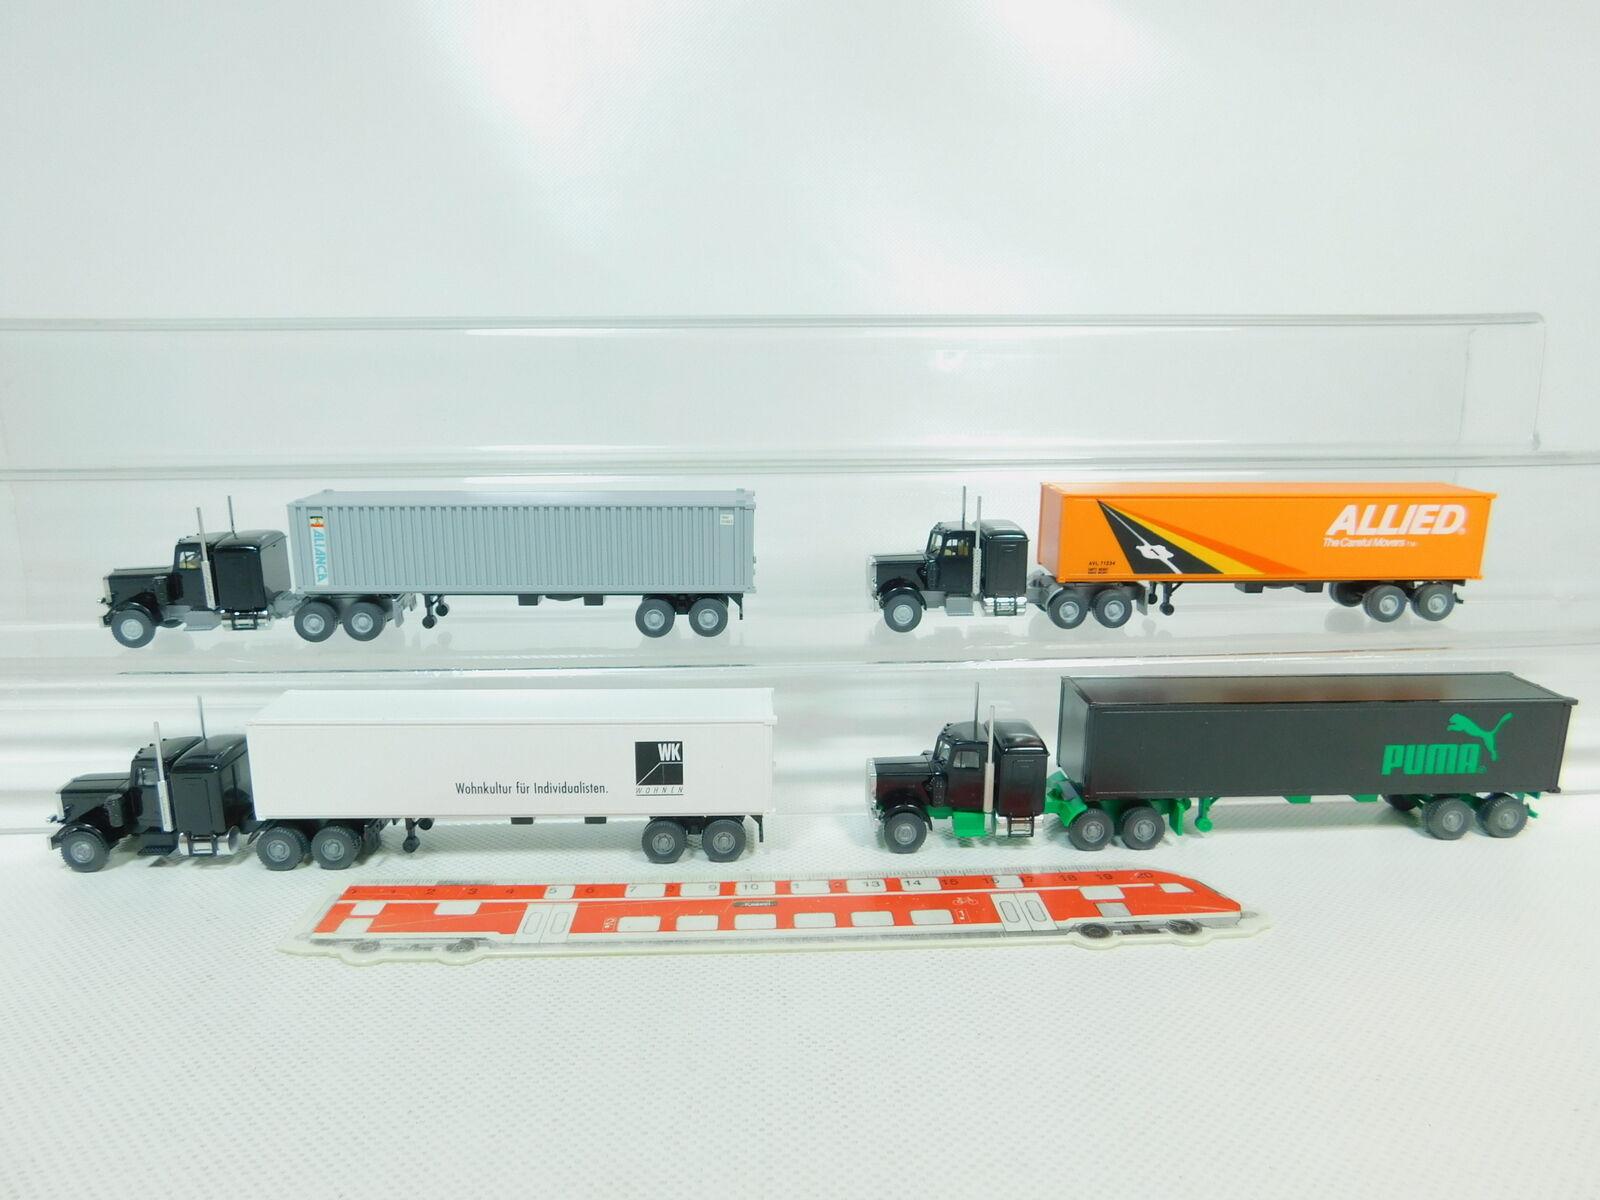 BO759-0,5 x Wiking H0 1 87 Camion Us Peterbilt    Alianca + Puma + Allied + 1ec46a